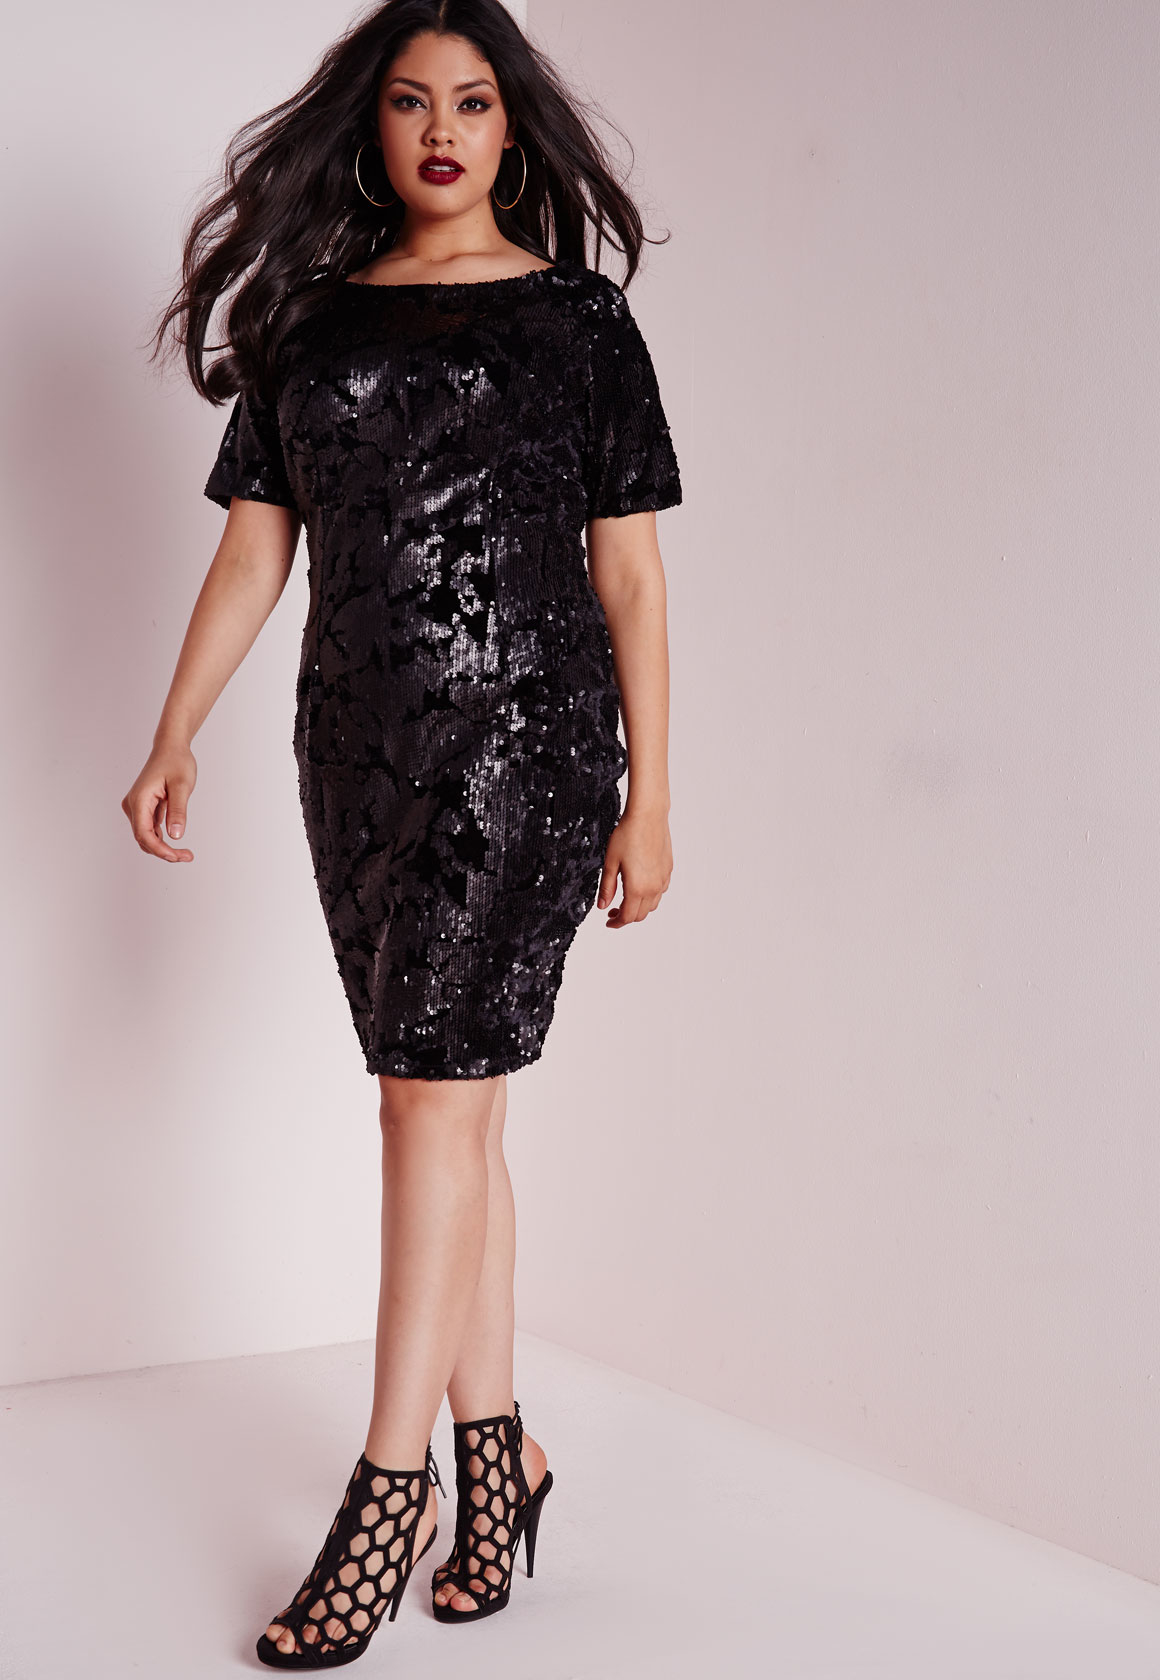 fc0279dd810 Plus Size Sequin Dresses Cheap - Dress Foto and Picture